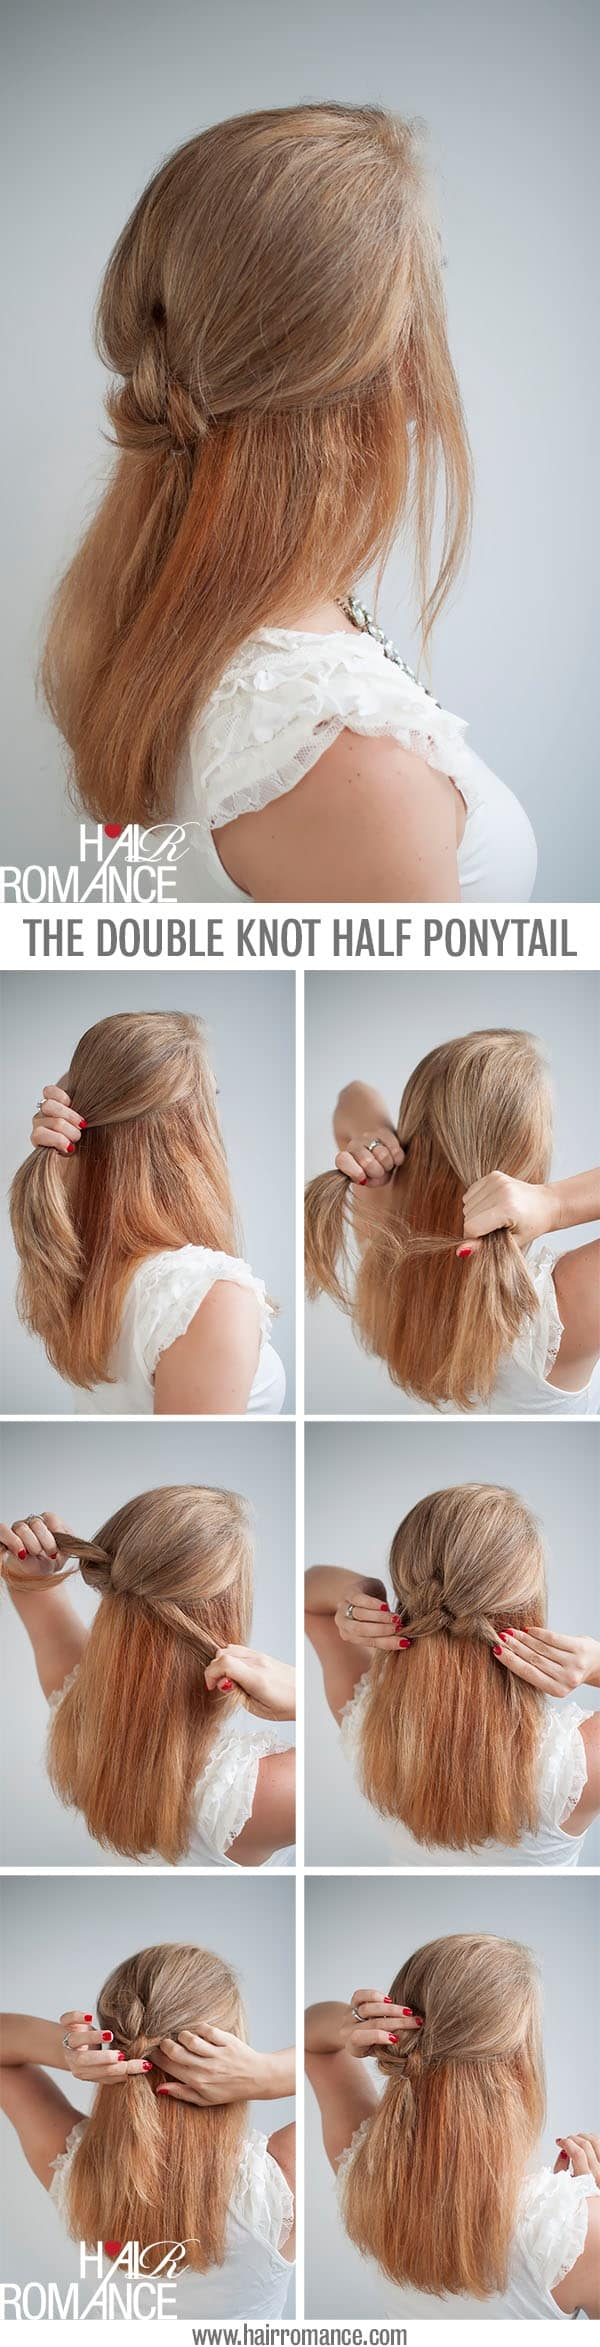 easy 5 minute hairstyles